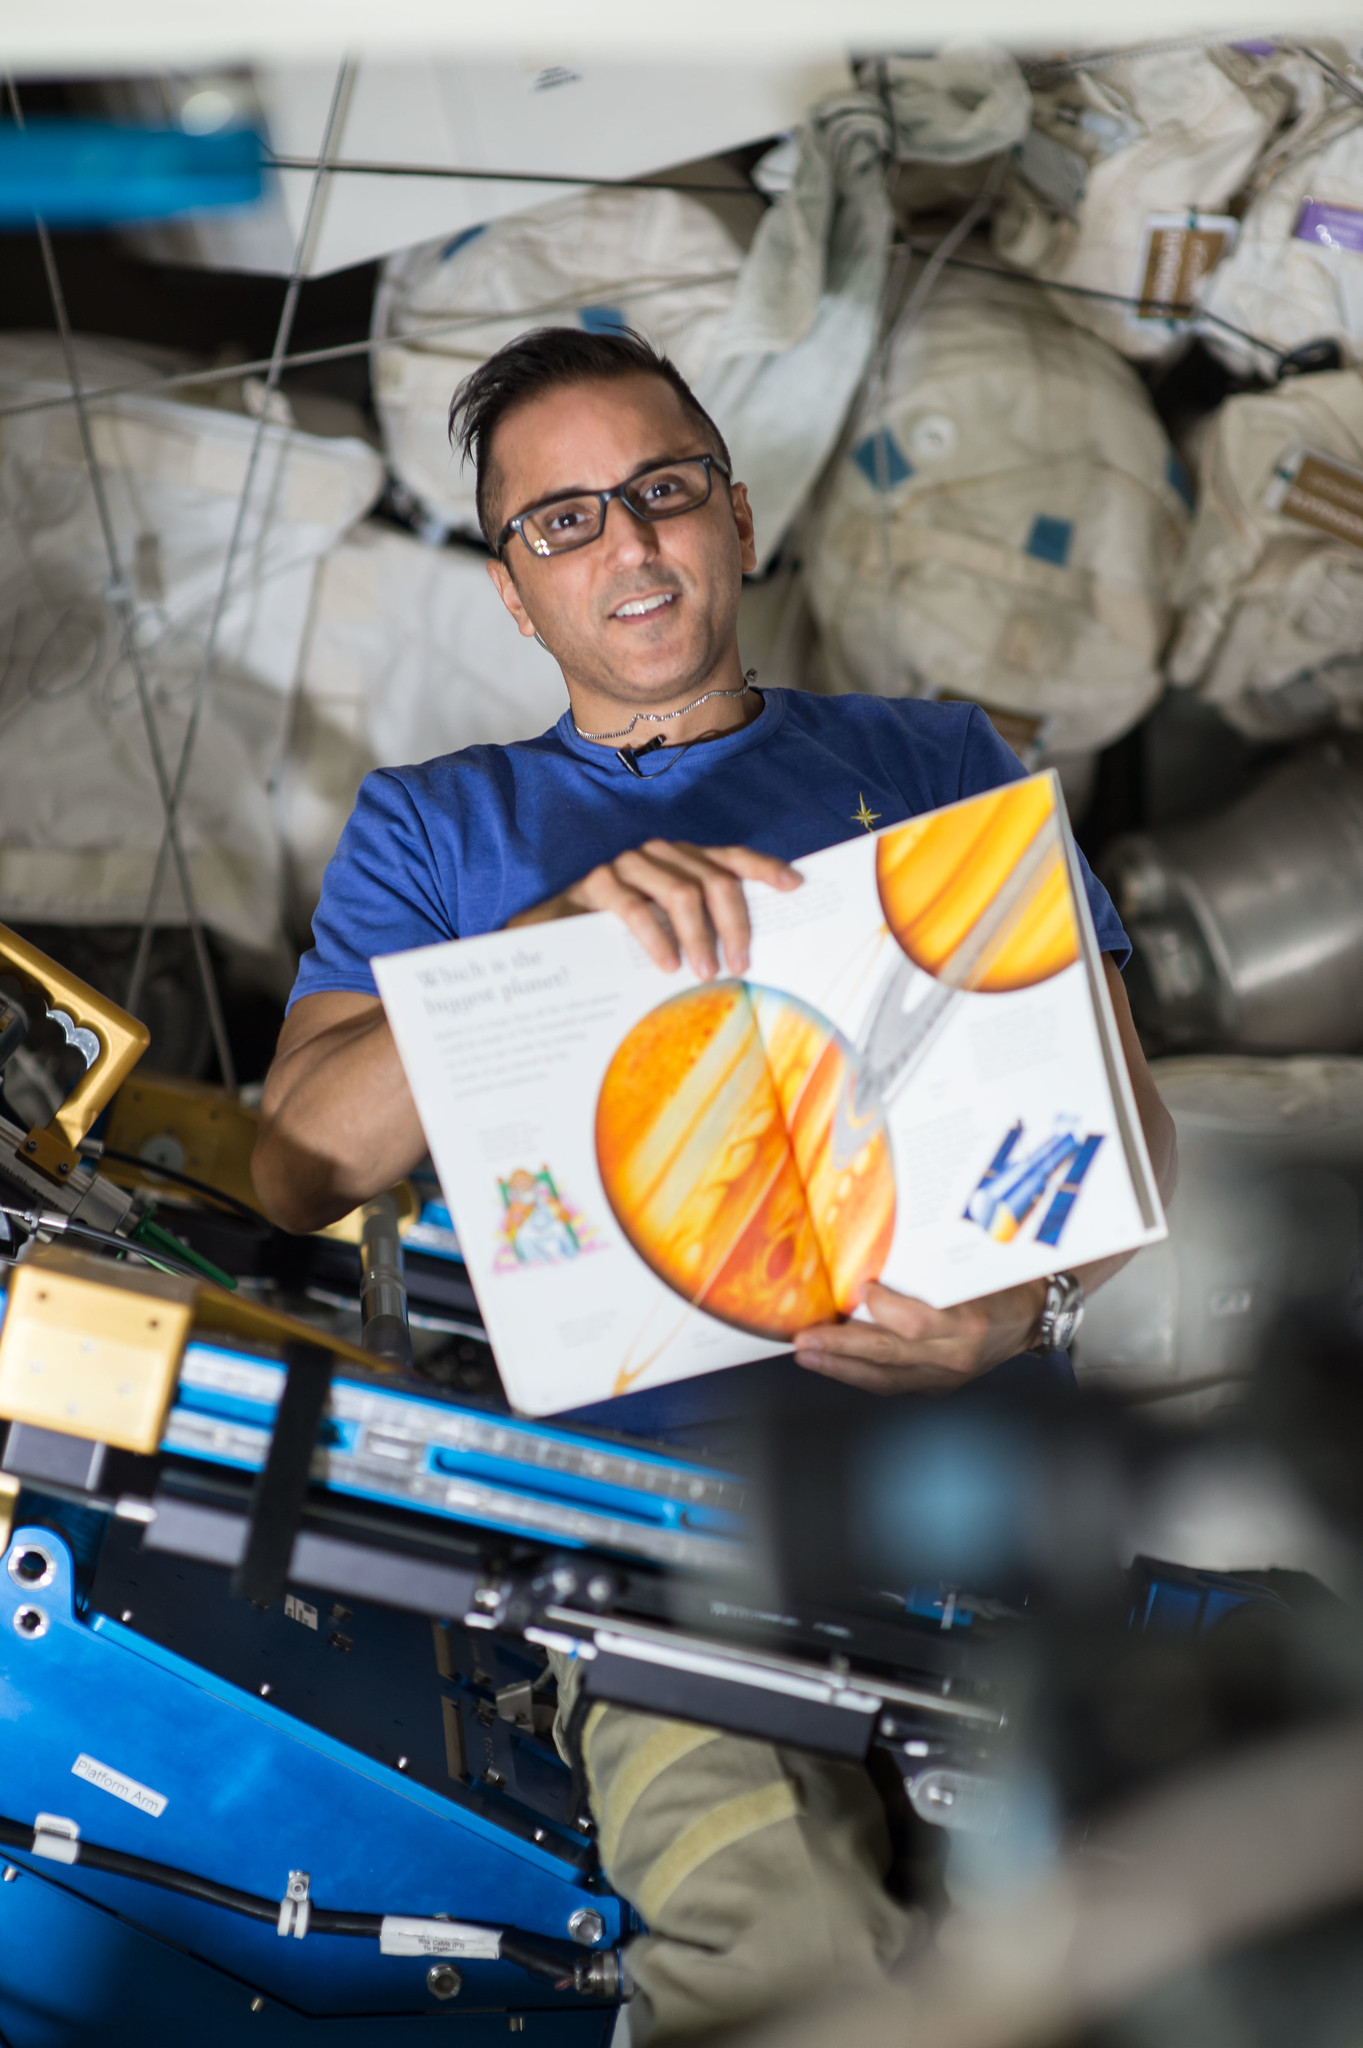 Joe Acaba: Geologist and Teacher Turned Astronaut